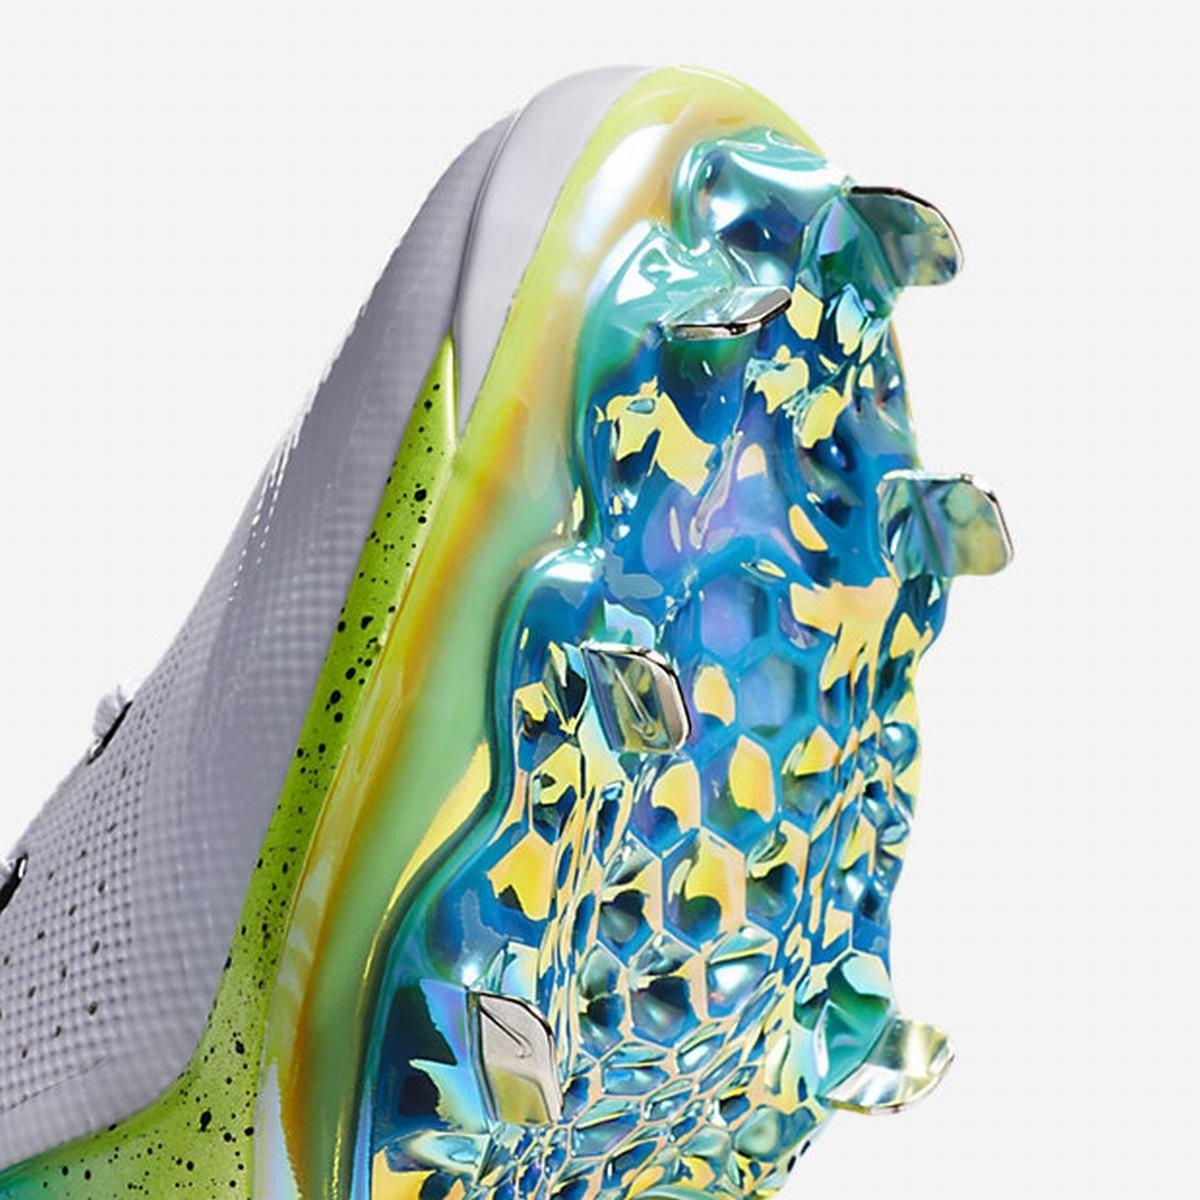 Amazon.com: Nike Force Zoom trucha 4 béisbol inglete hombre ...